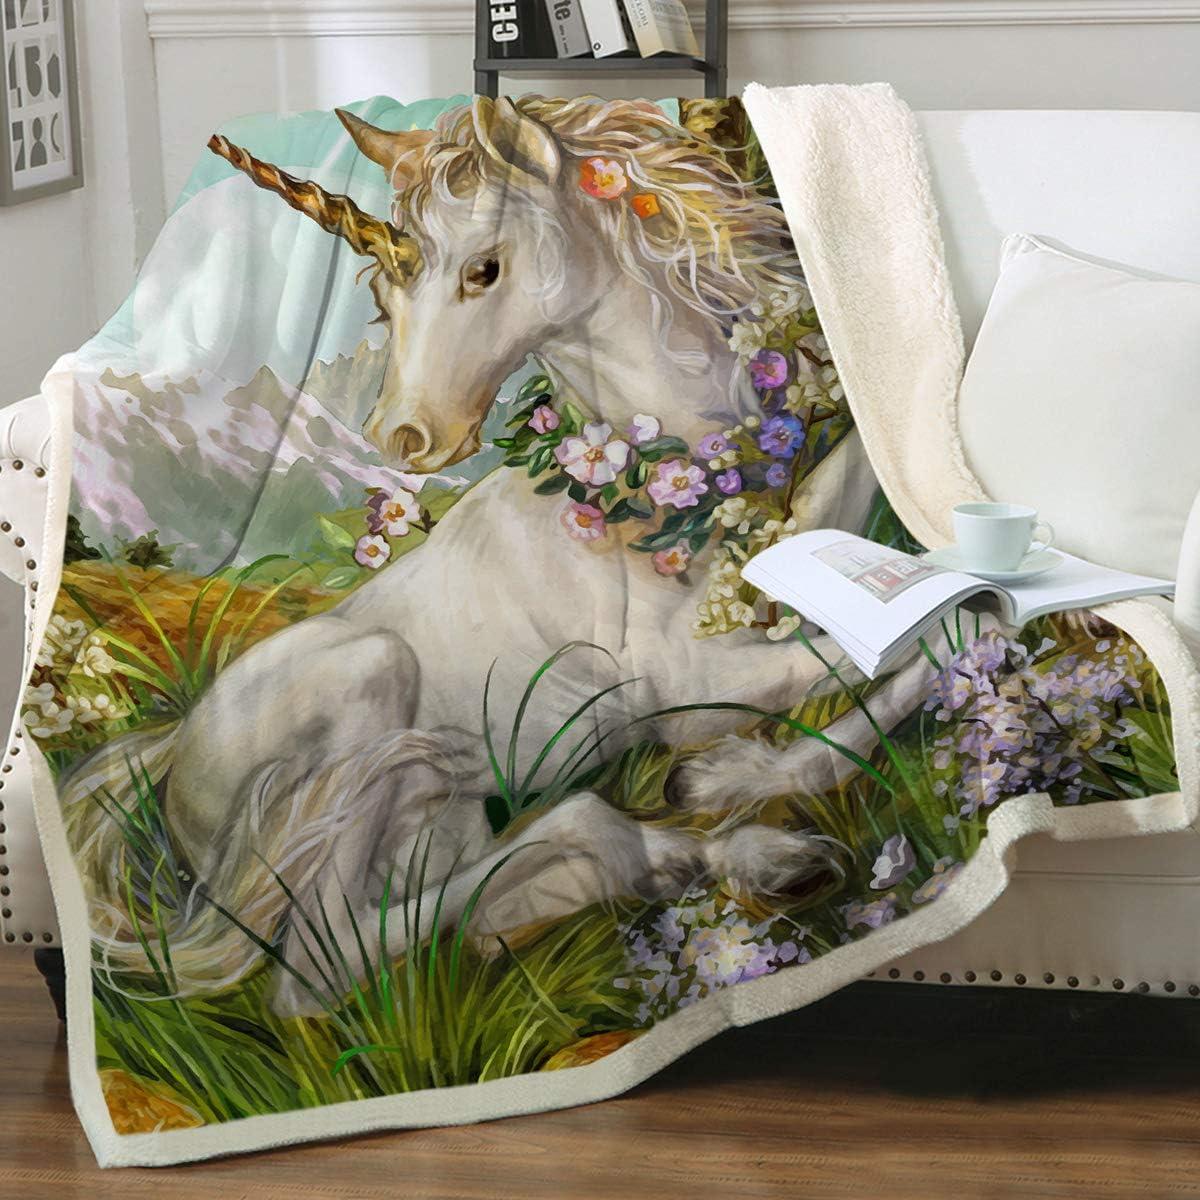 beautiful-unicorn-inspired-blanket